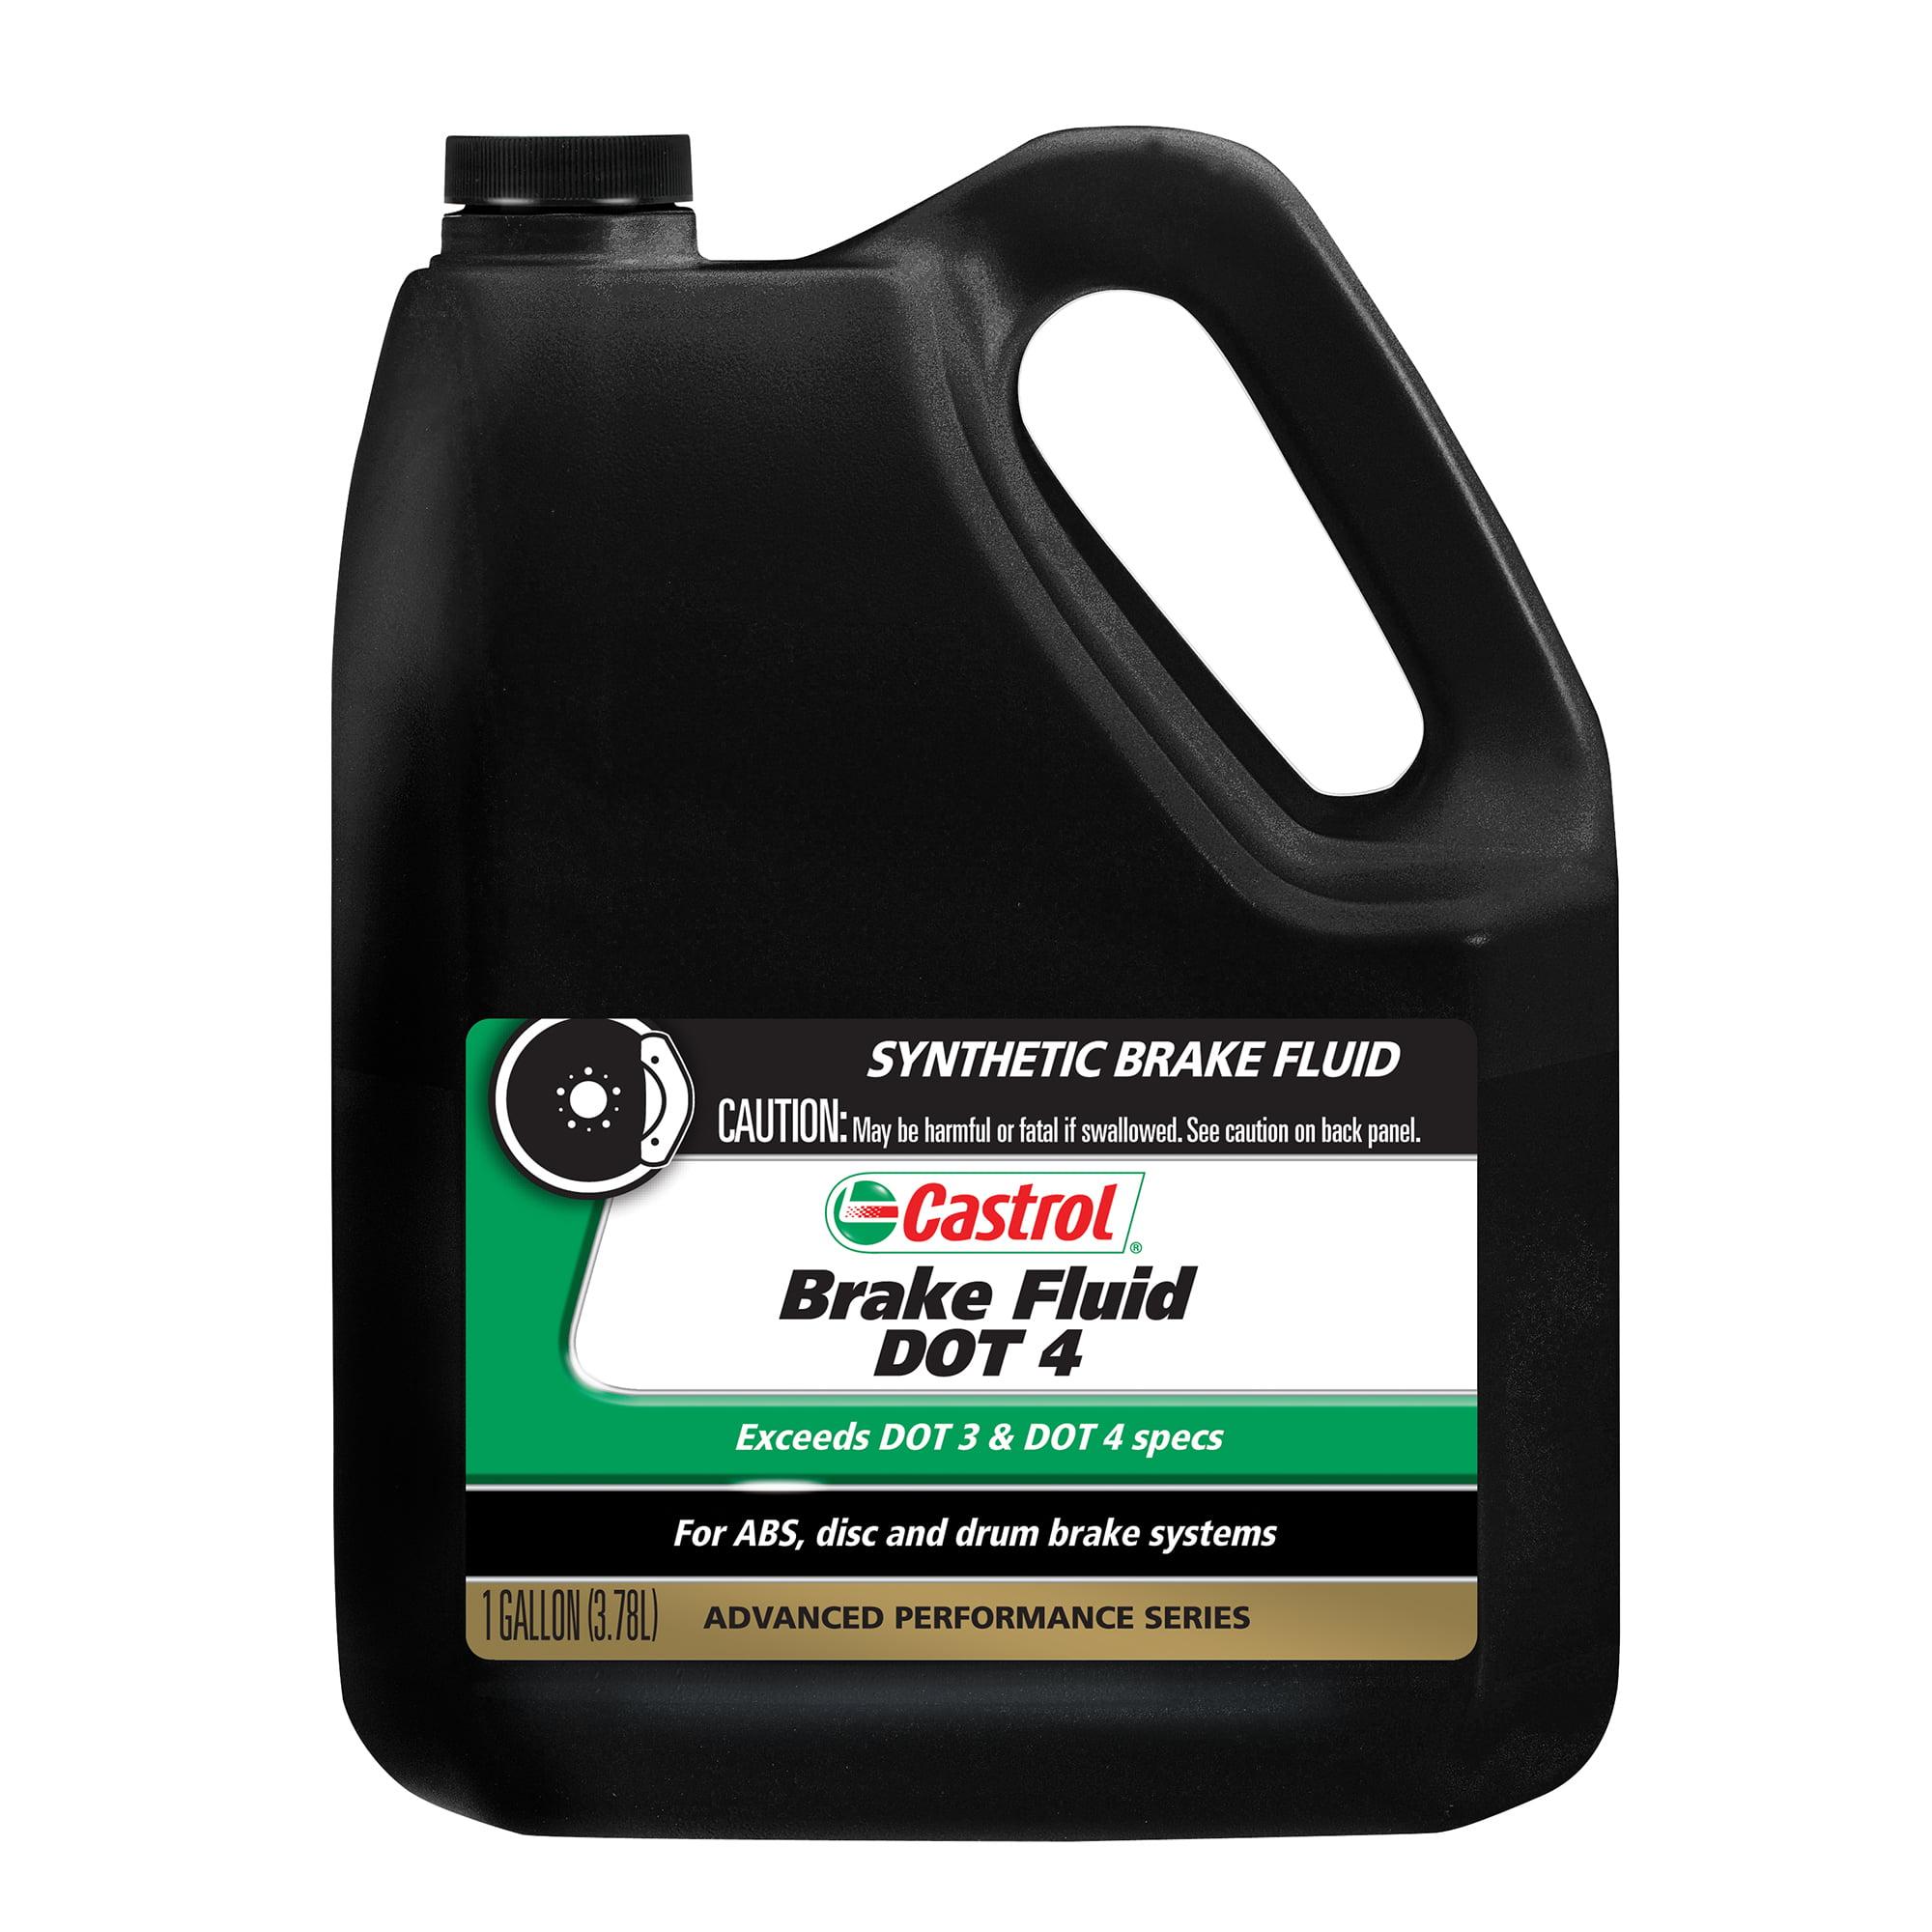 Castrol Brake Fluid DOT 4, 1 GAL